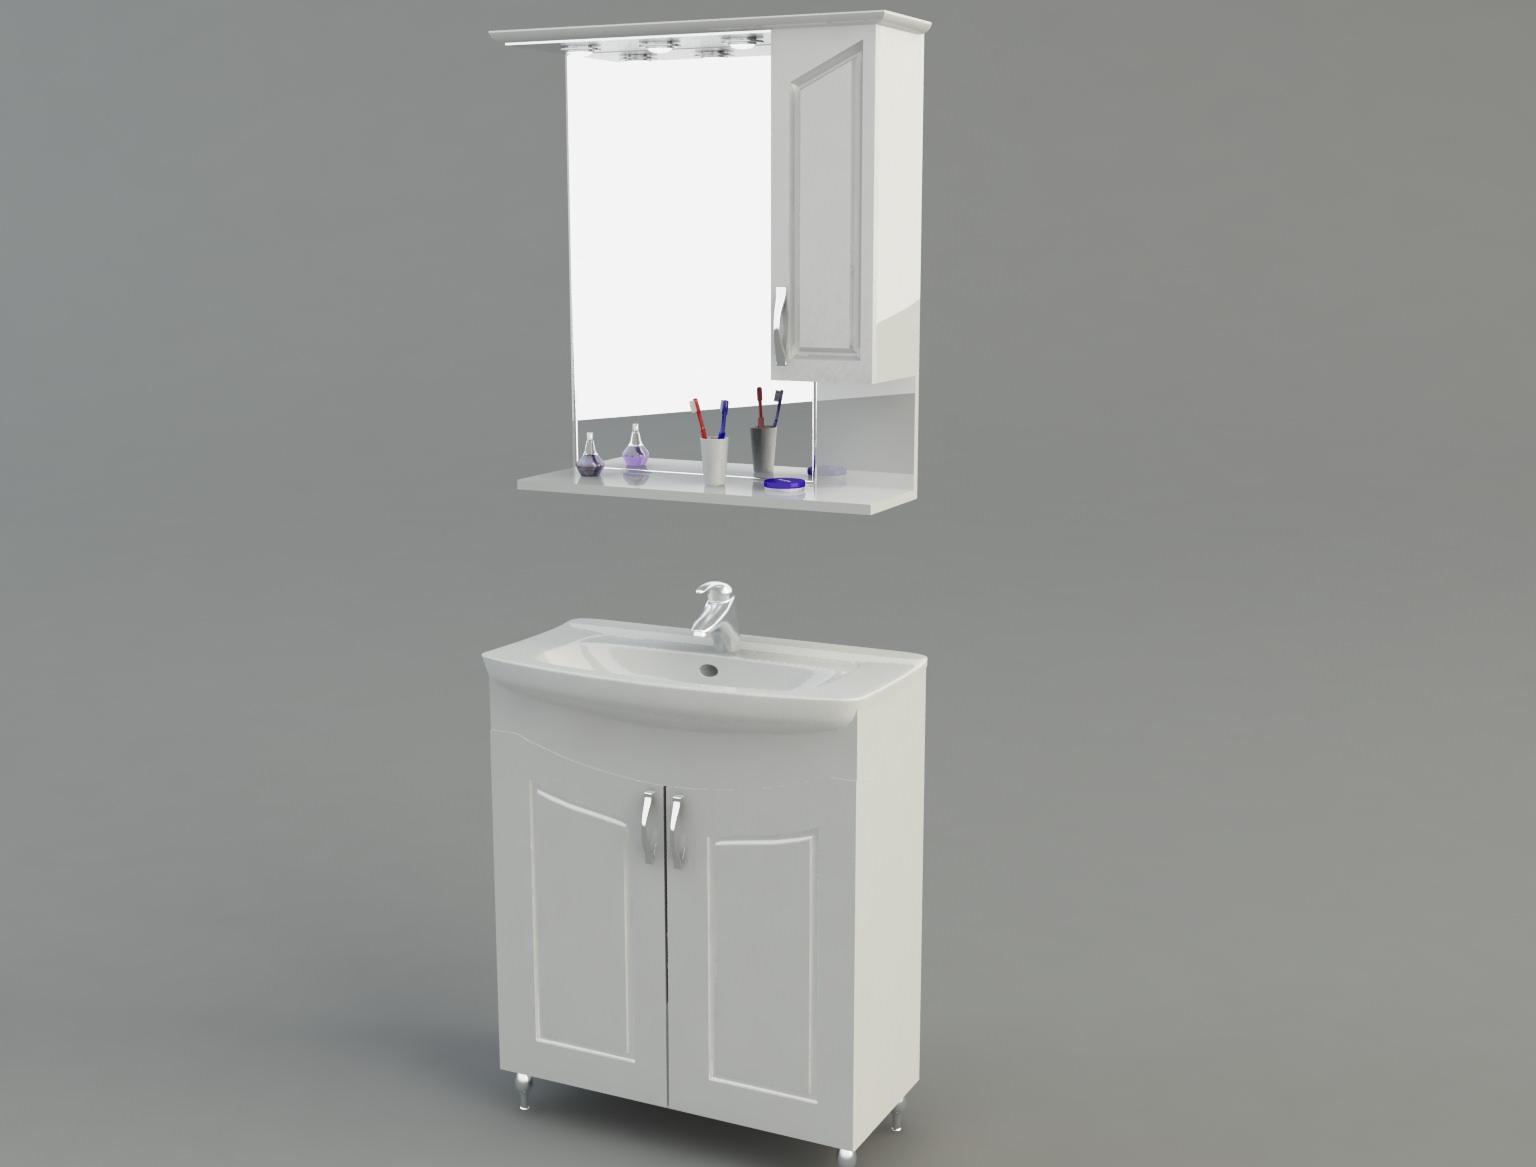 Bathroom cabinet 3d model max for Bathroom 3d